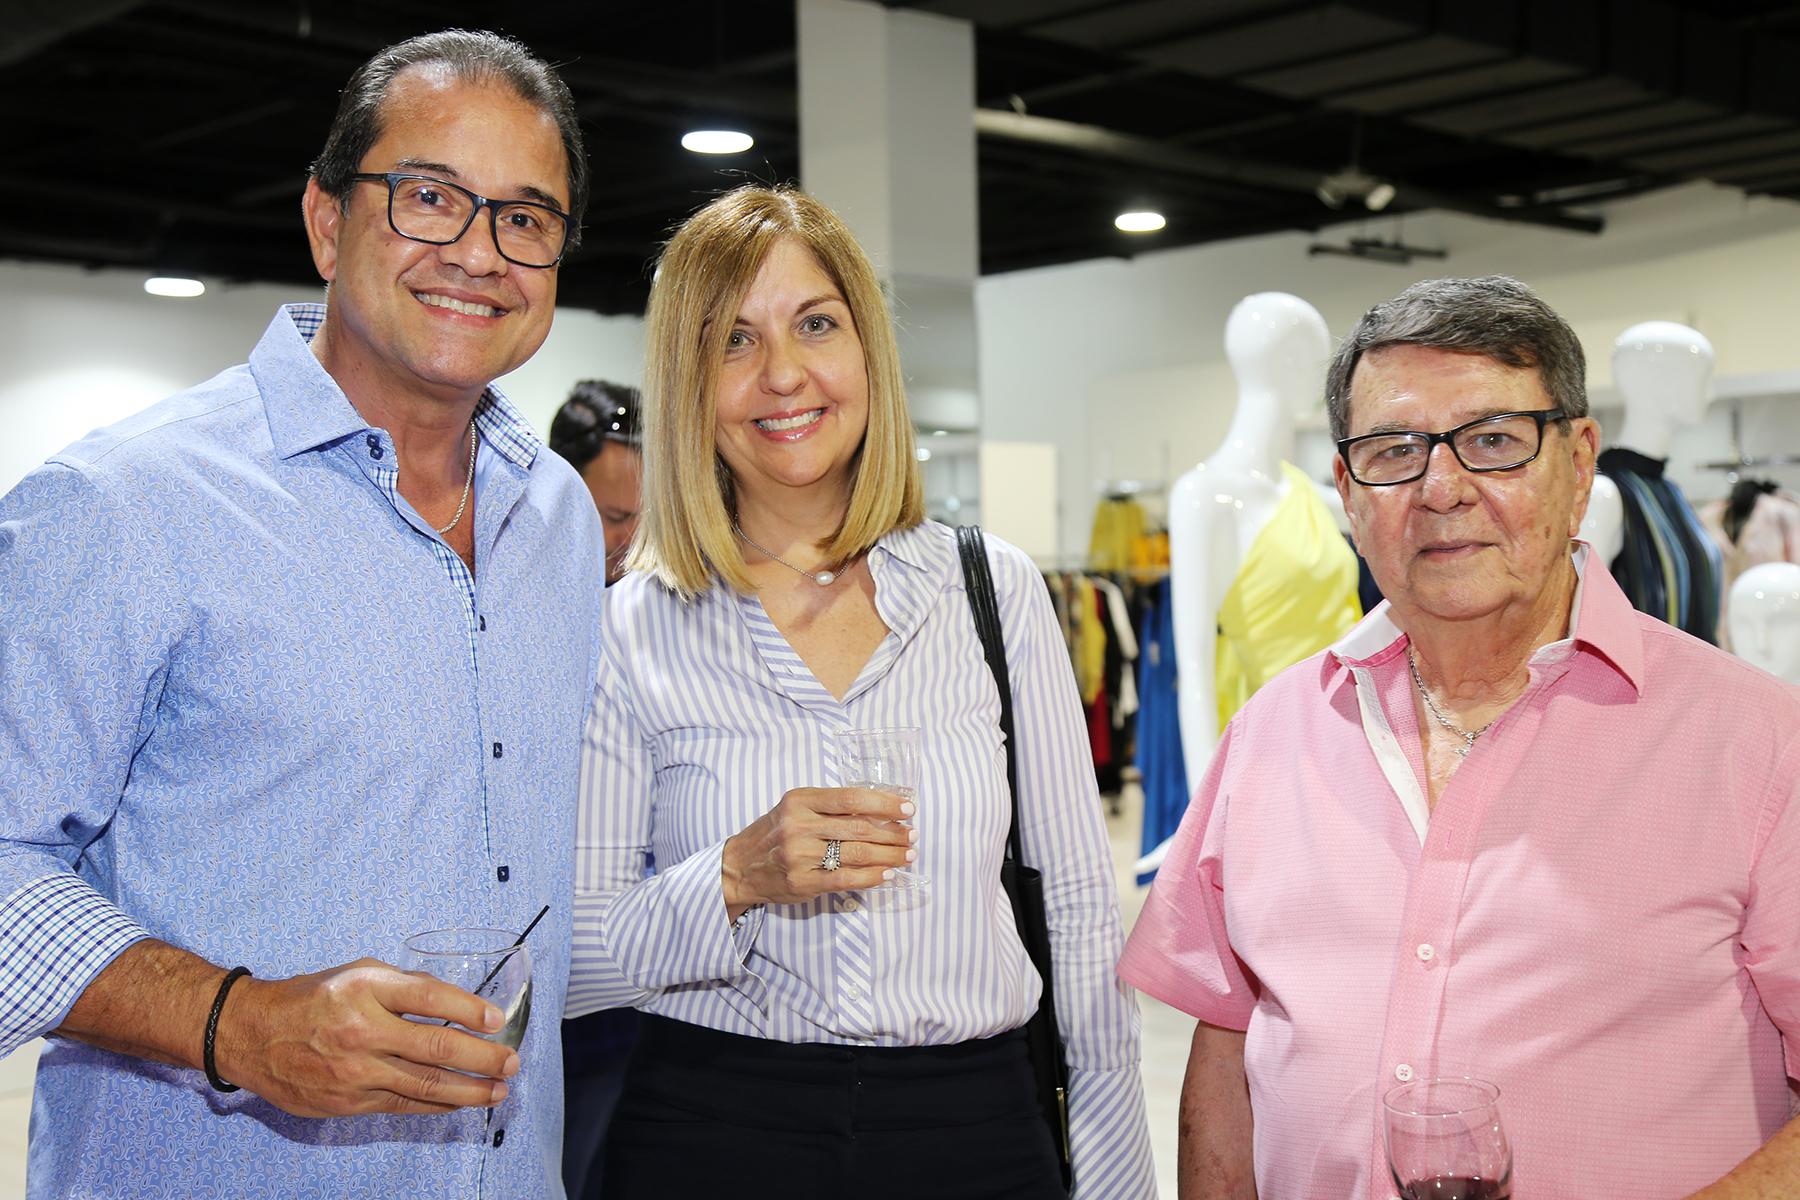 Rubén Rosario, Carmen Guillermety y Ramón Arrieta. (Nichole Saldarriaga)